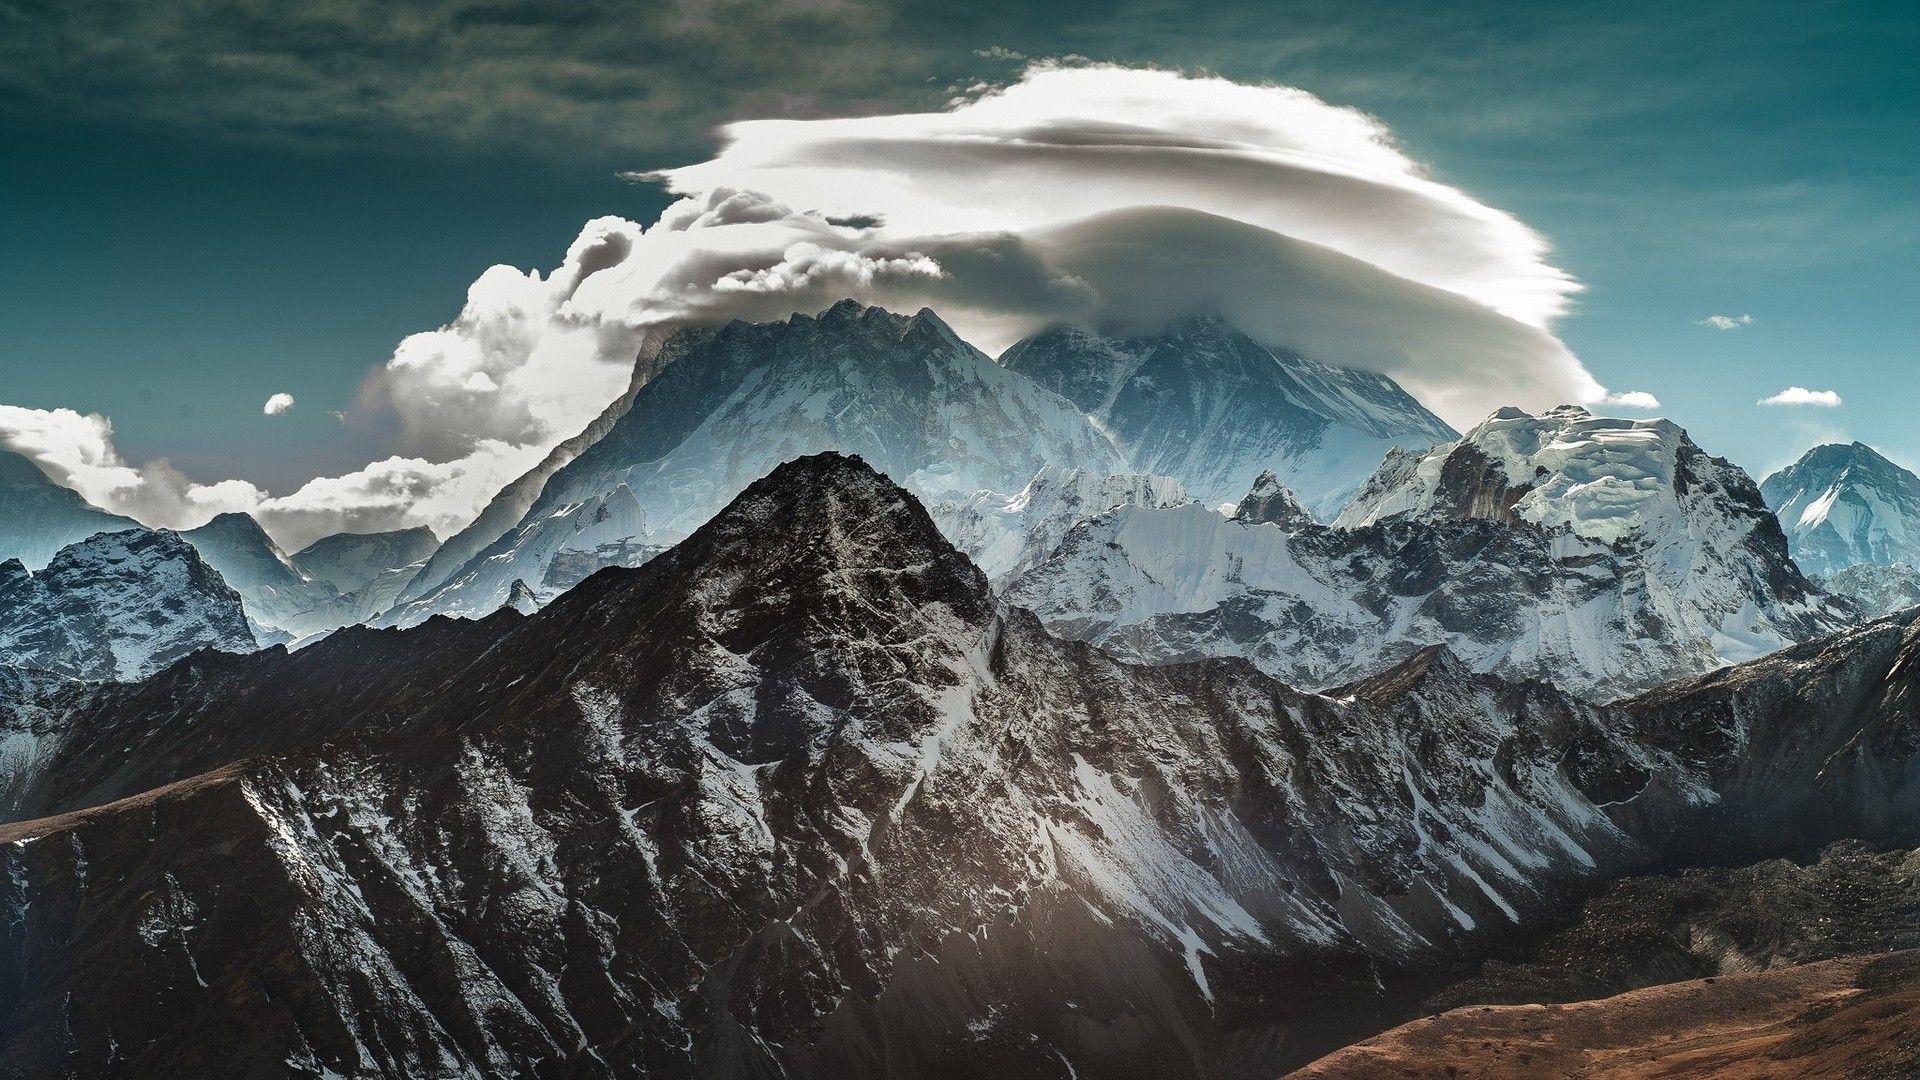 Himalaya Wallpaper Mountain Landscape Mountain Images Scenery